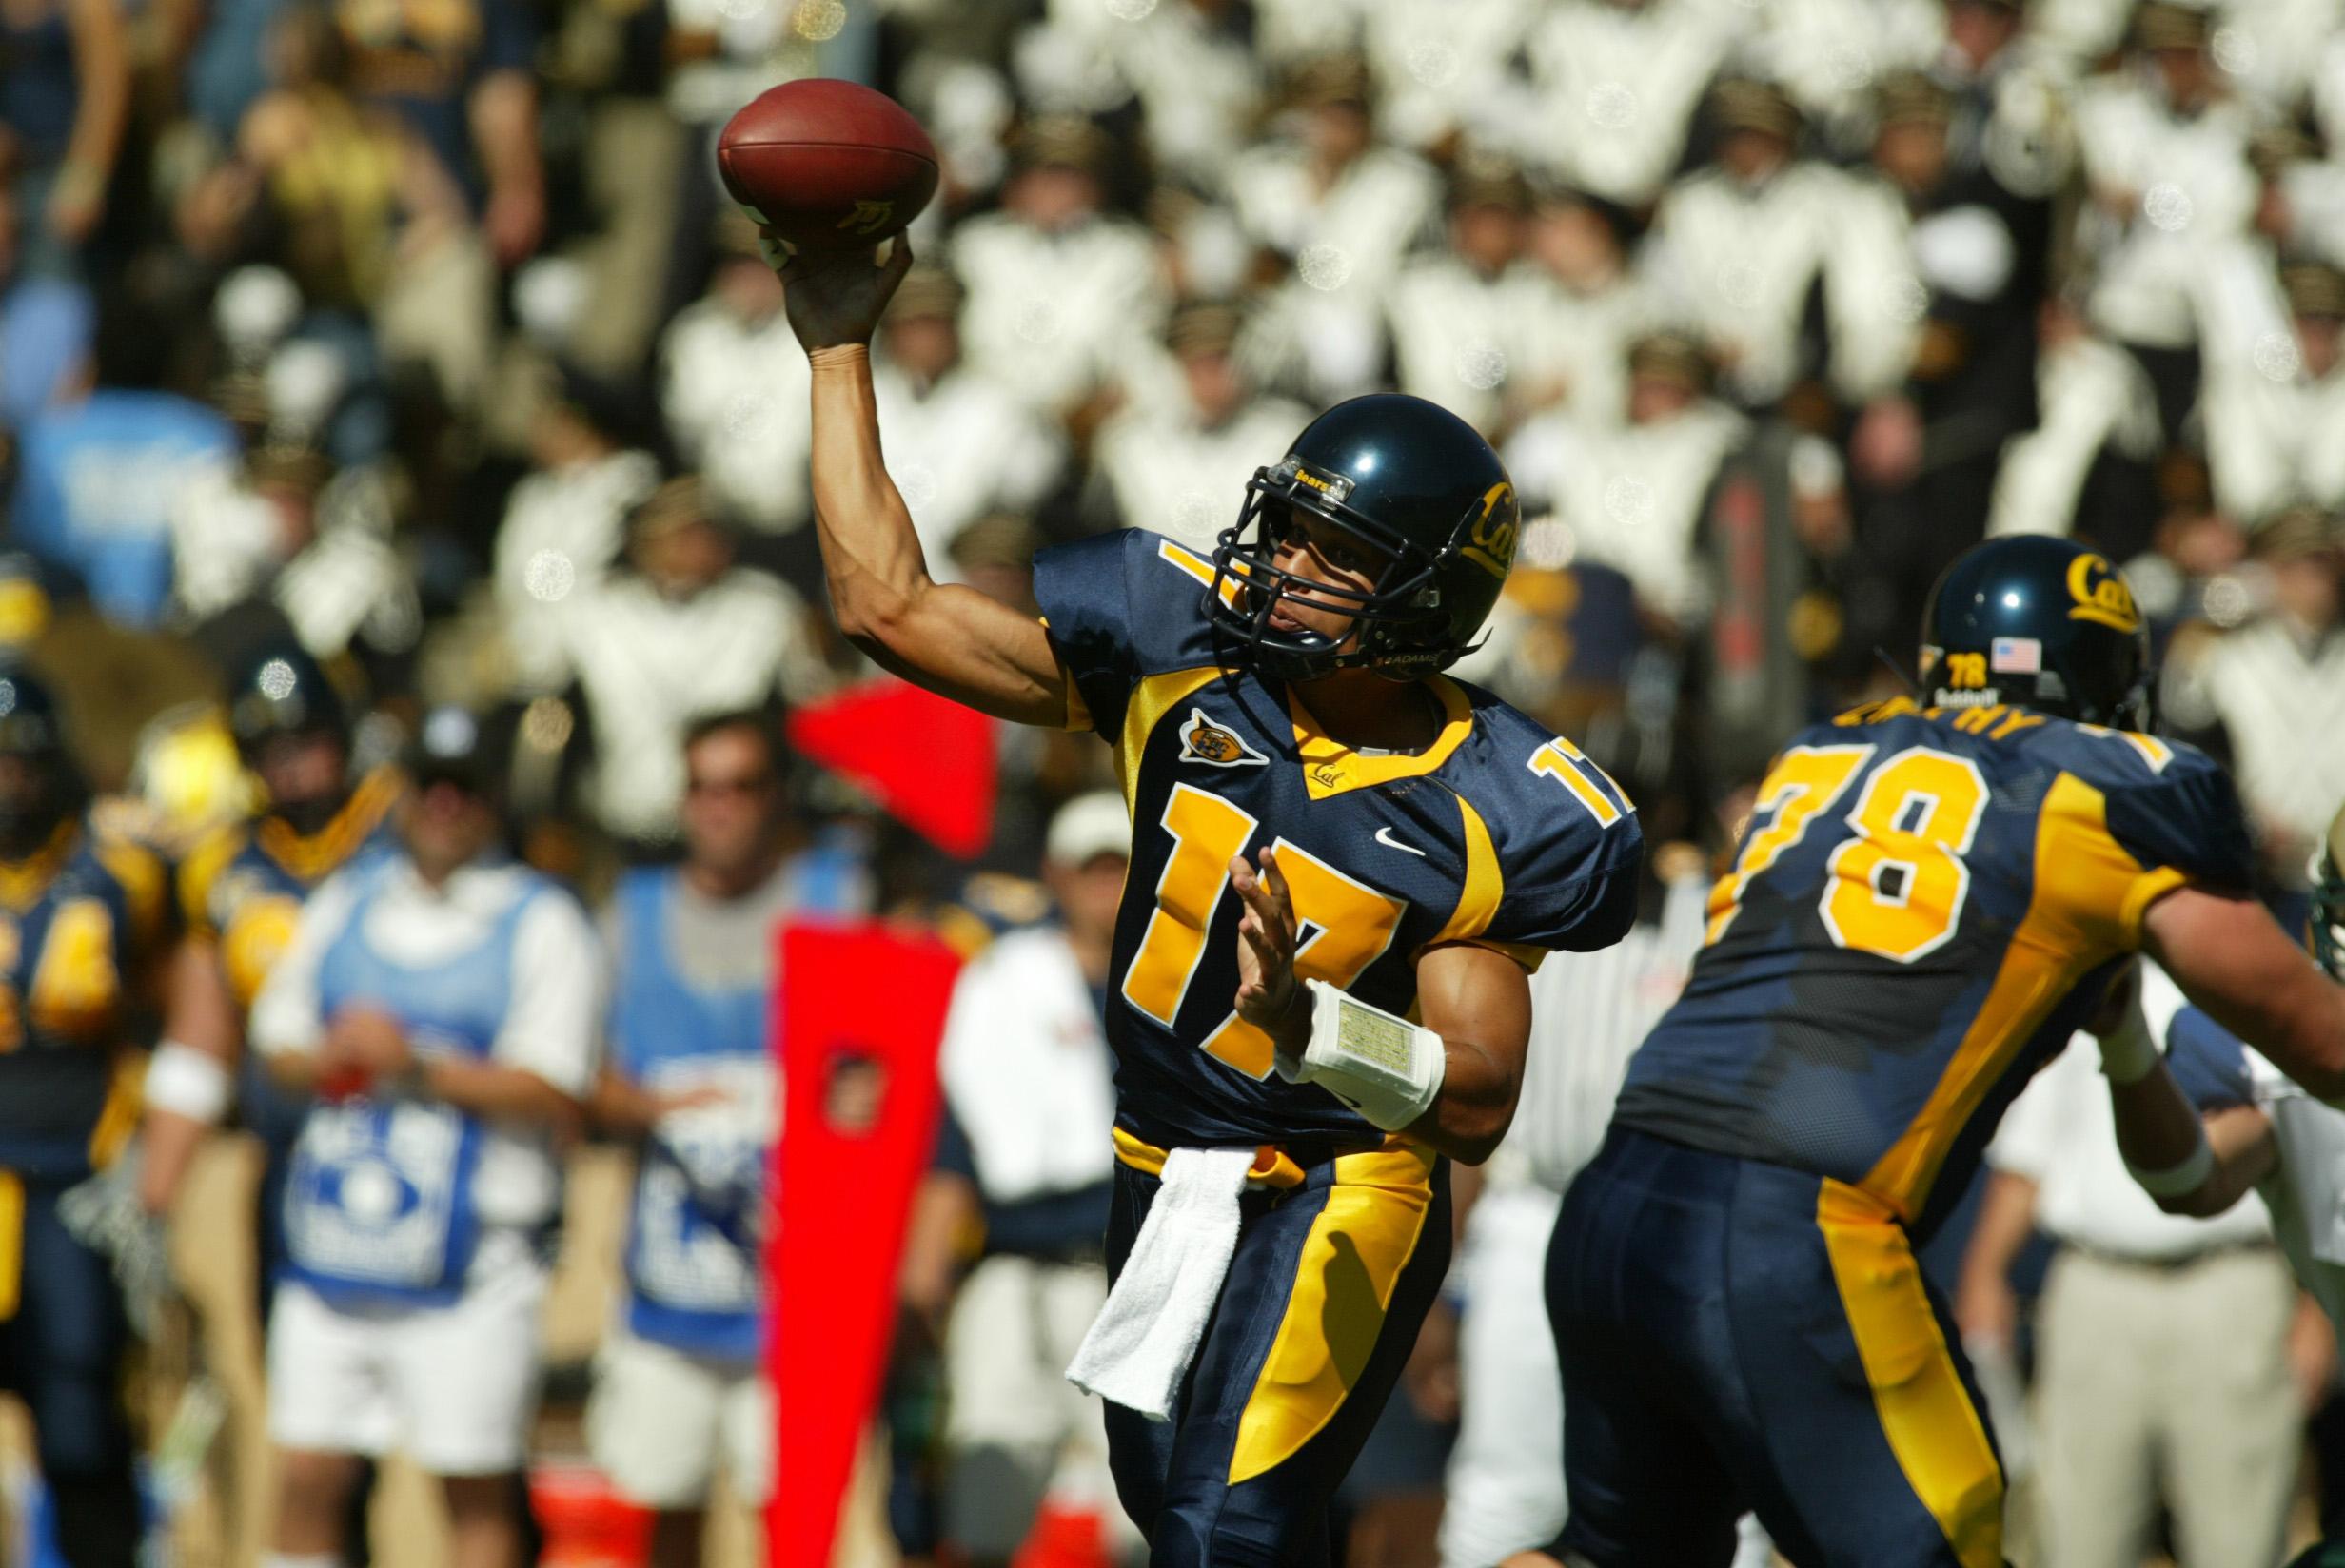 My favorite Cal quarterback playing alongside a very dear friend.